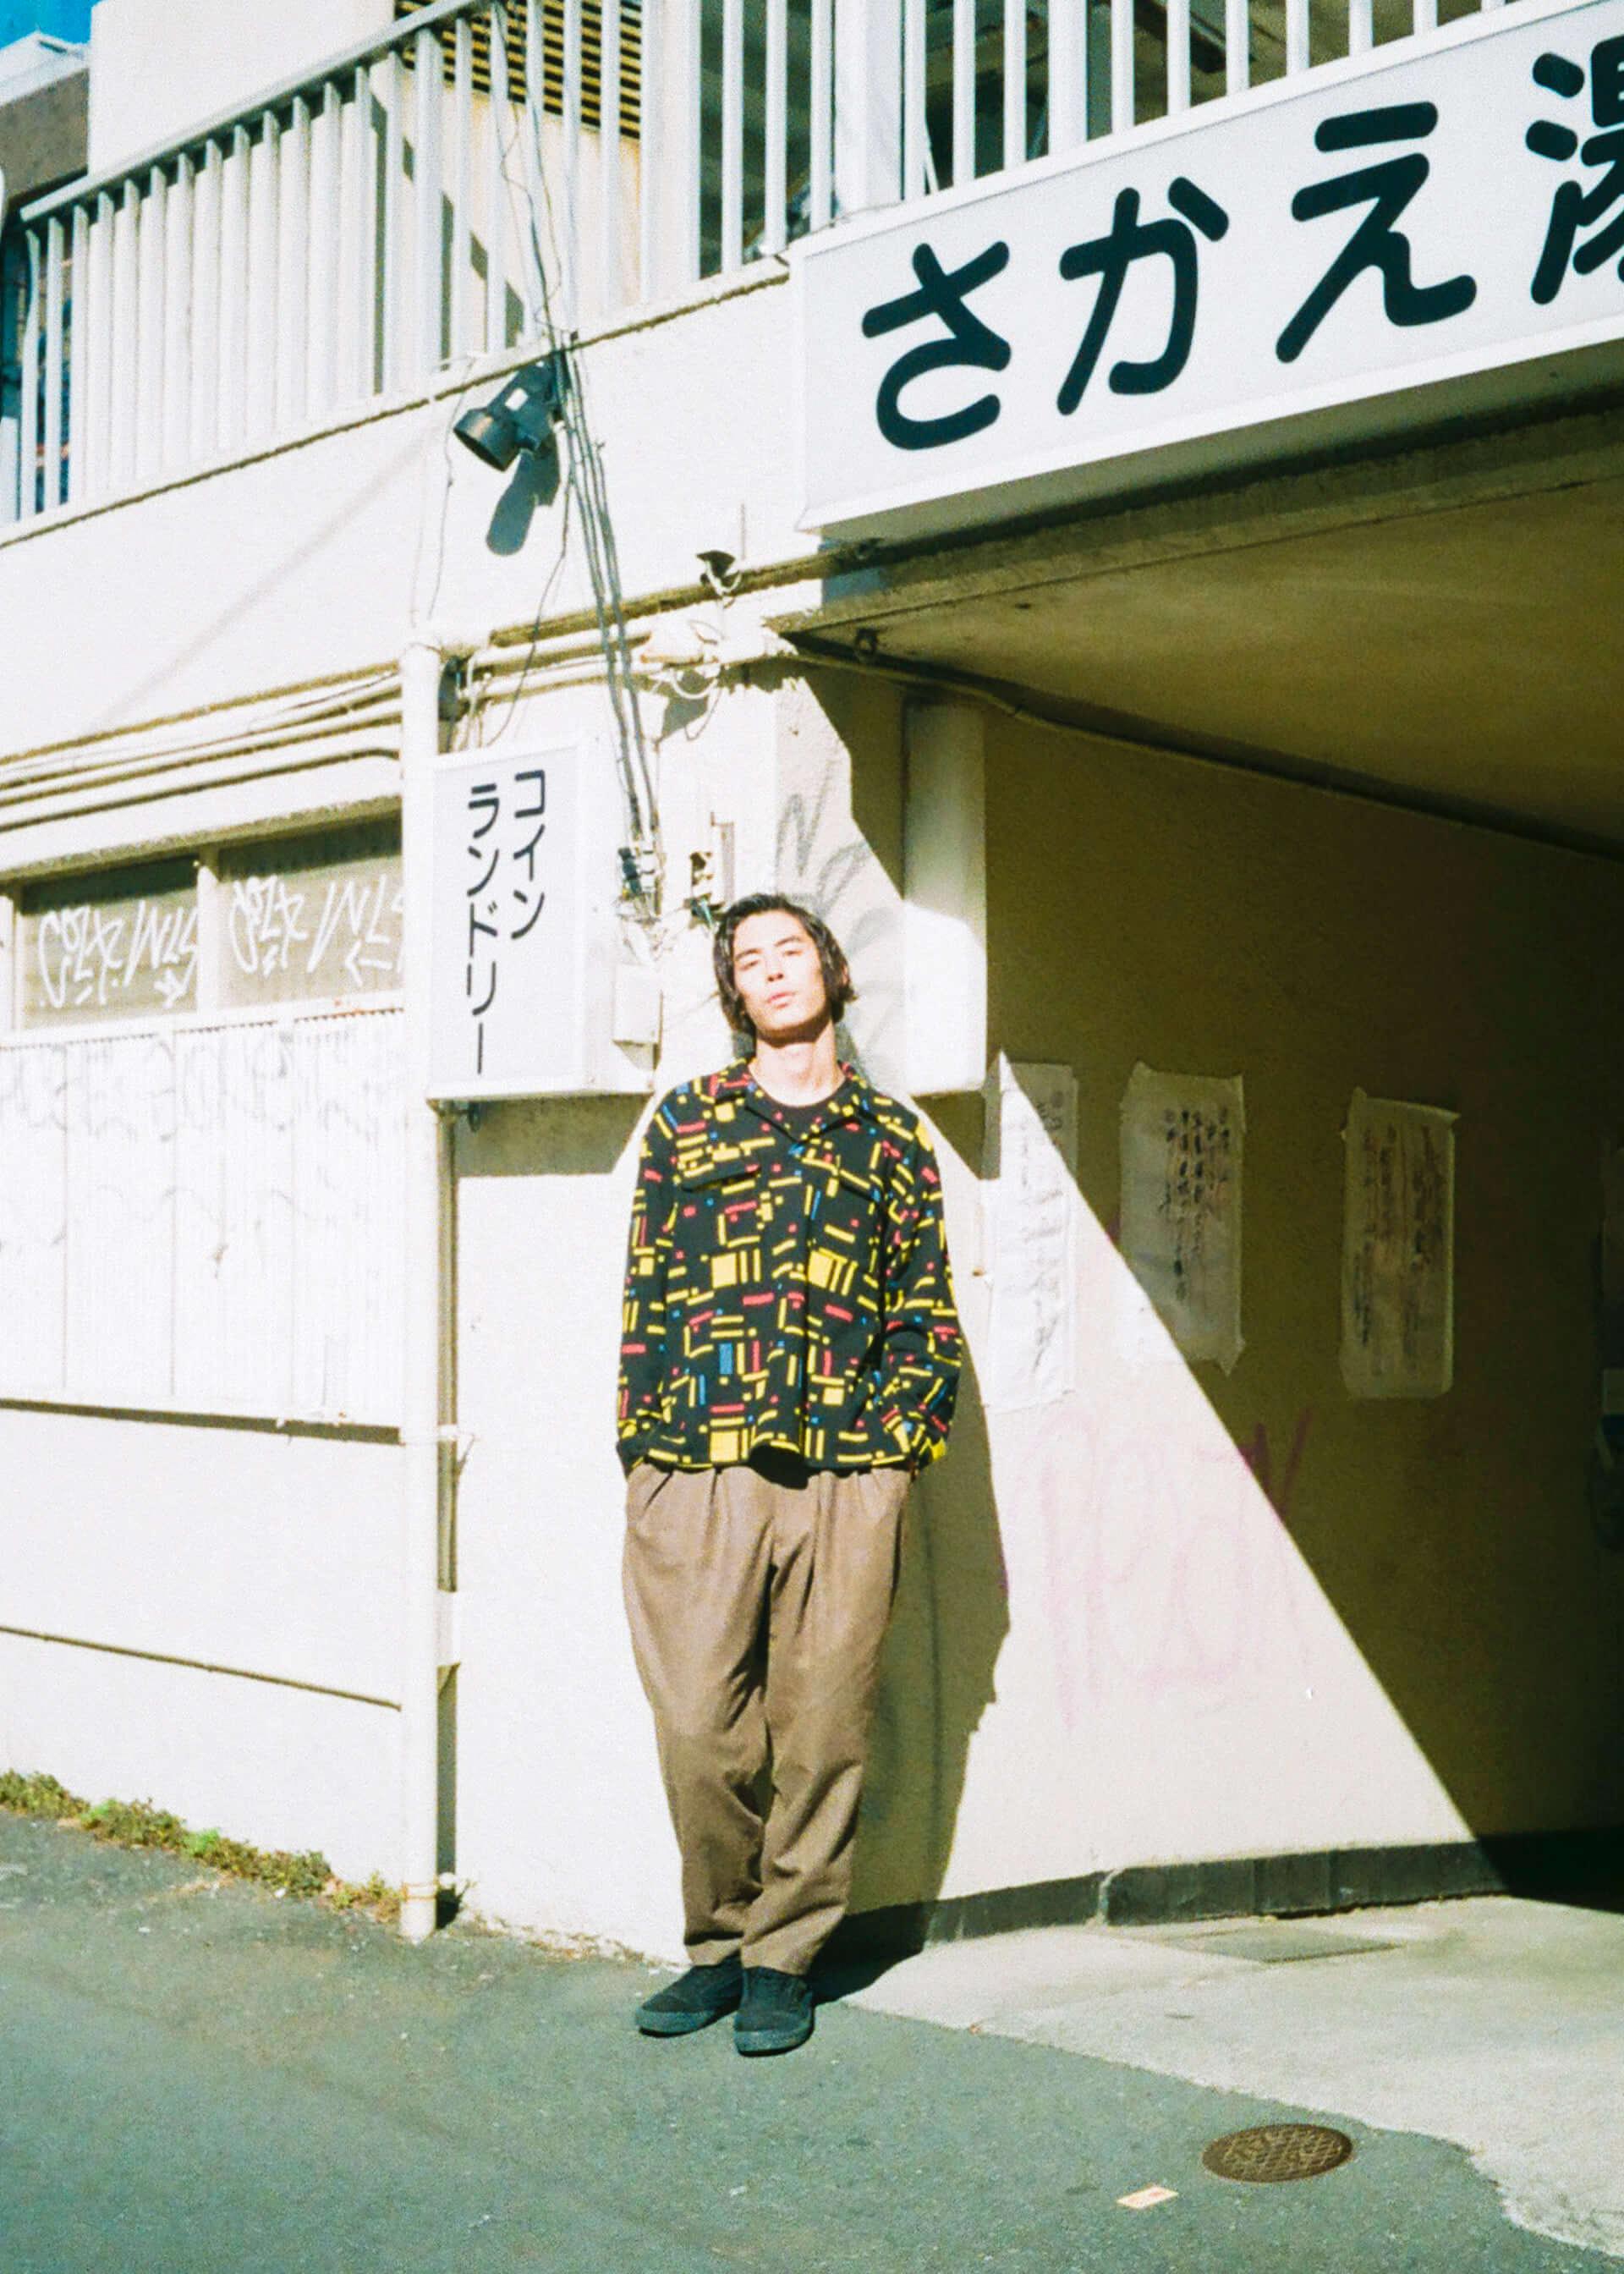 【25's view】岩渕 想太|25人の25歳へインタビュー interview_191120_iwabuchi_11-1920x2688